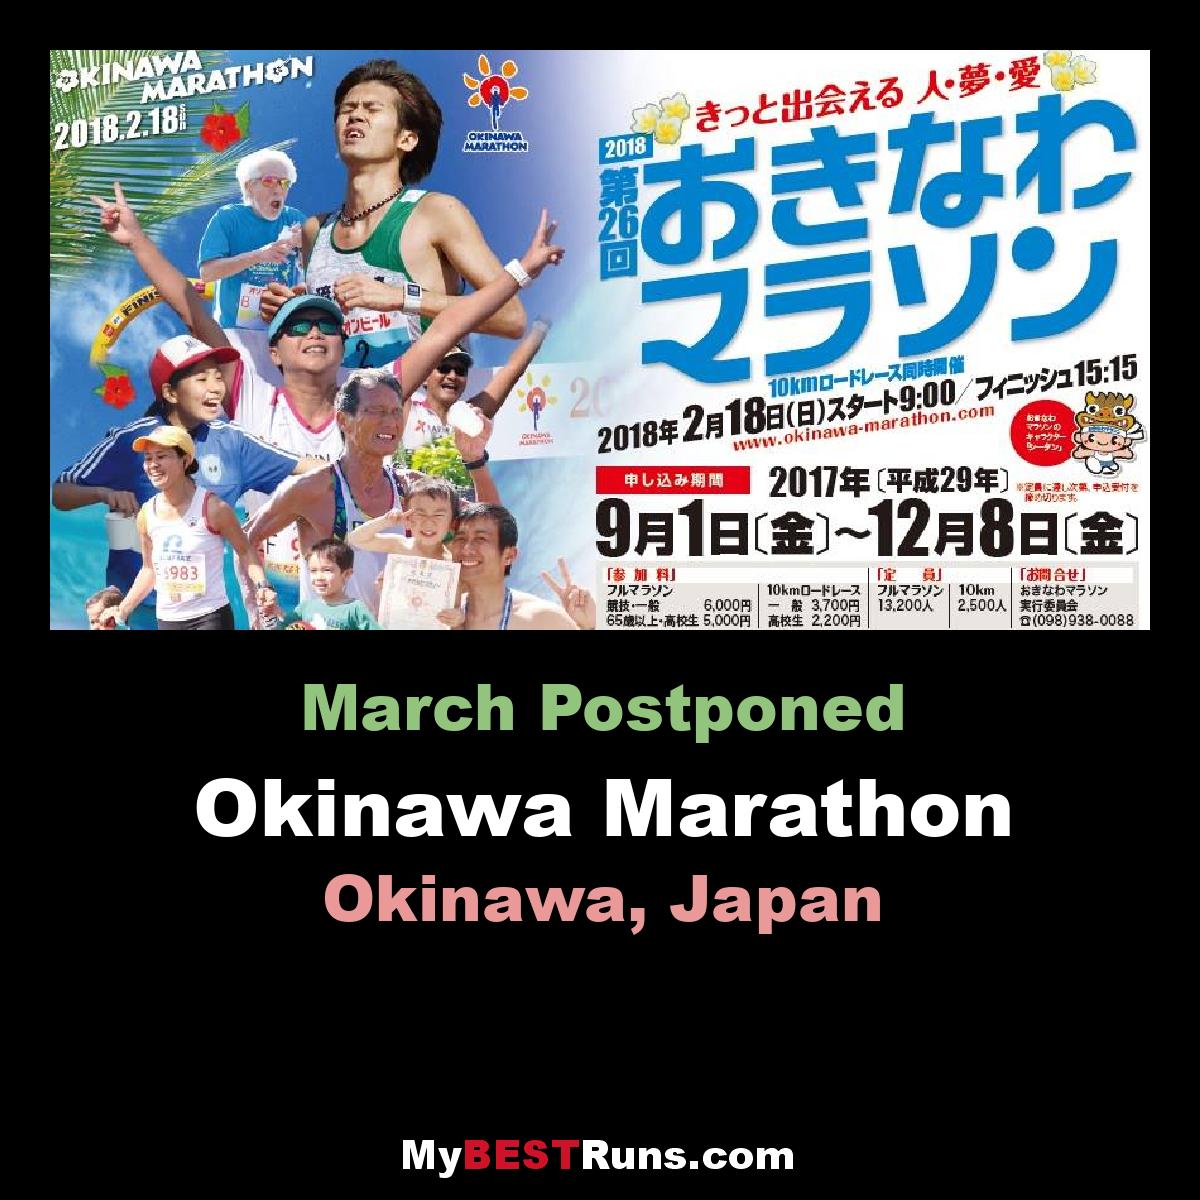 Okinawa Marathon